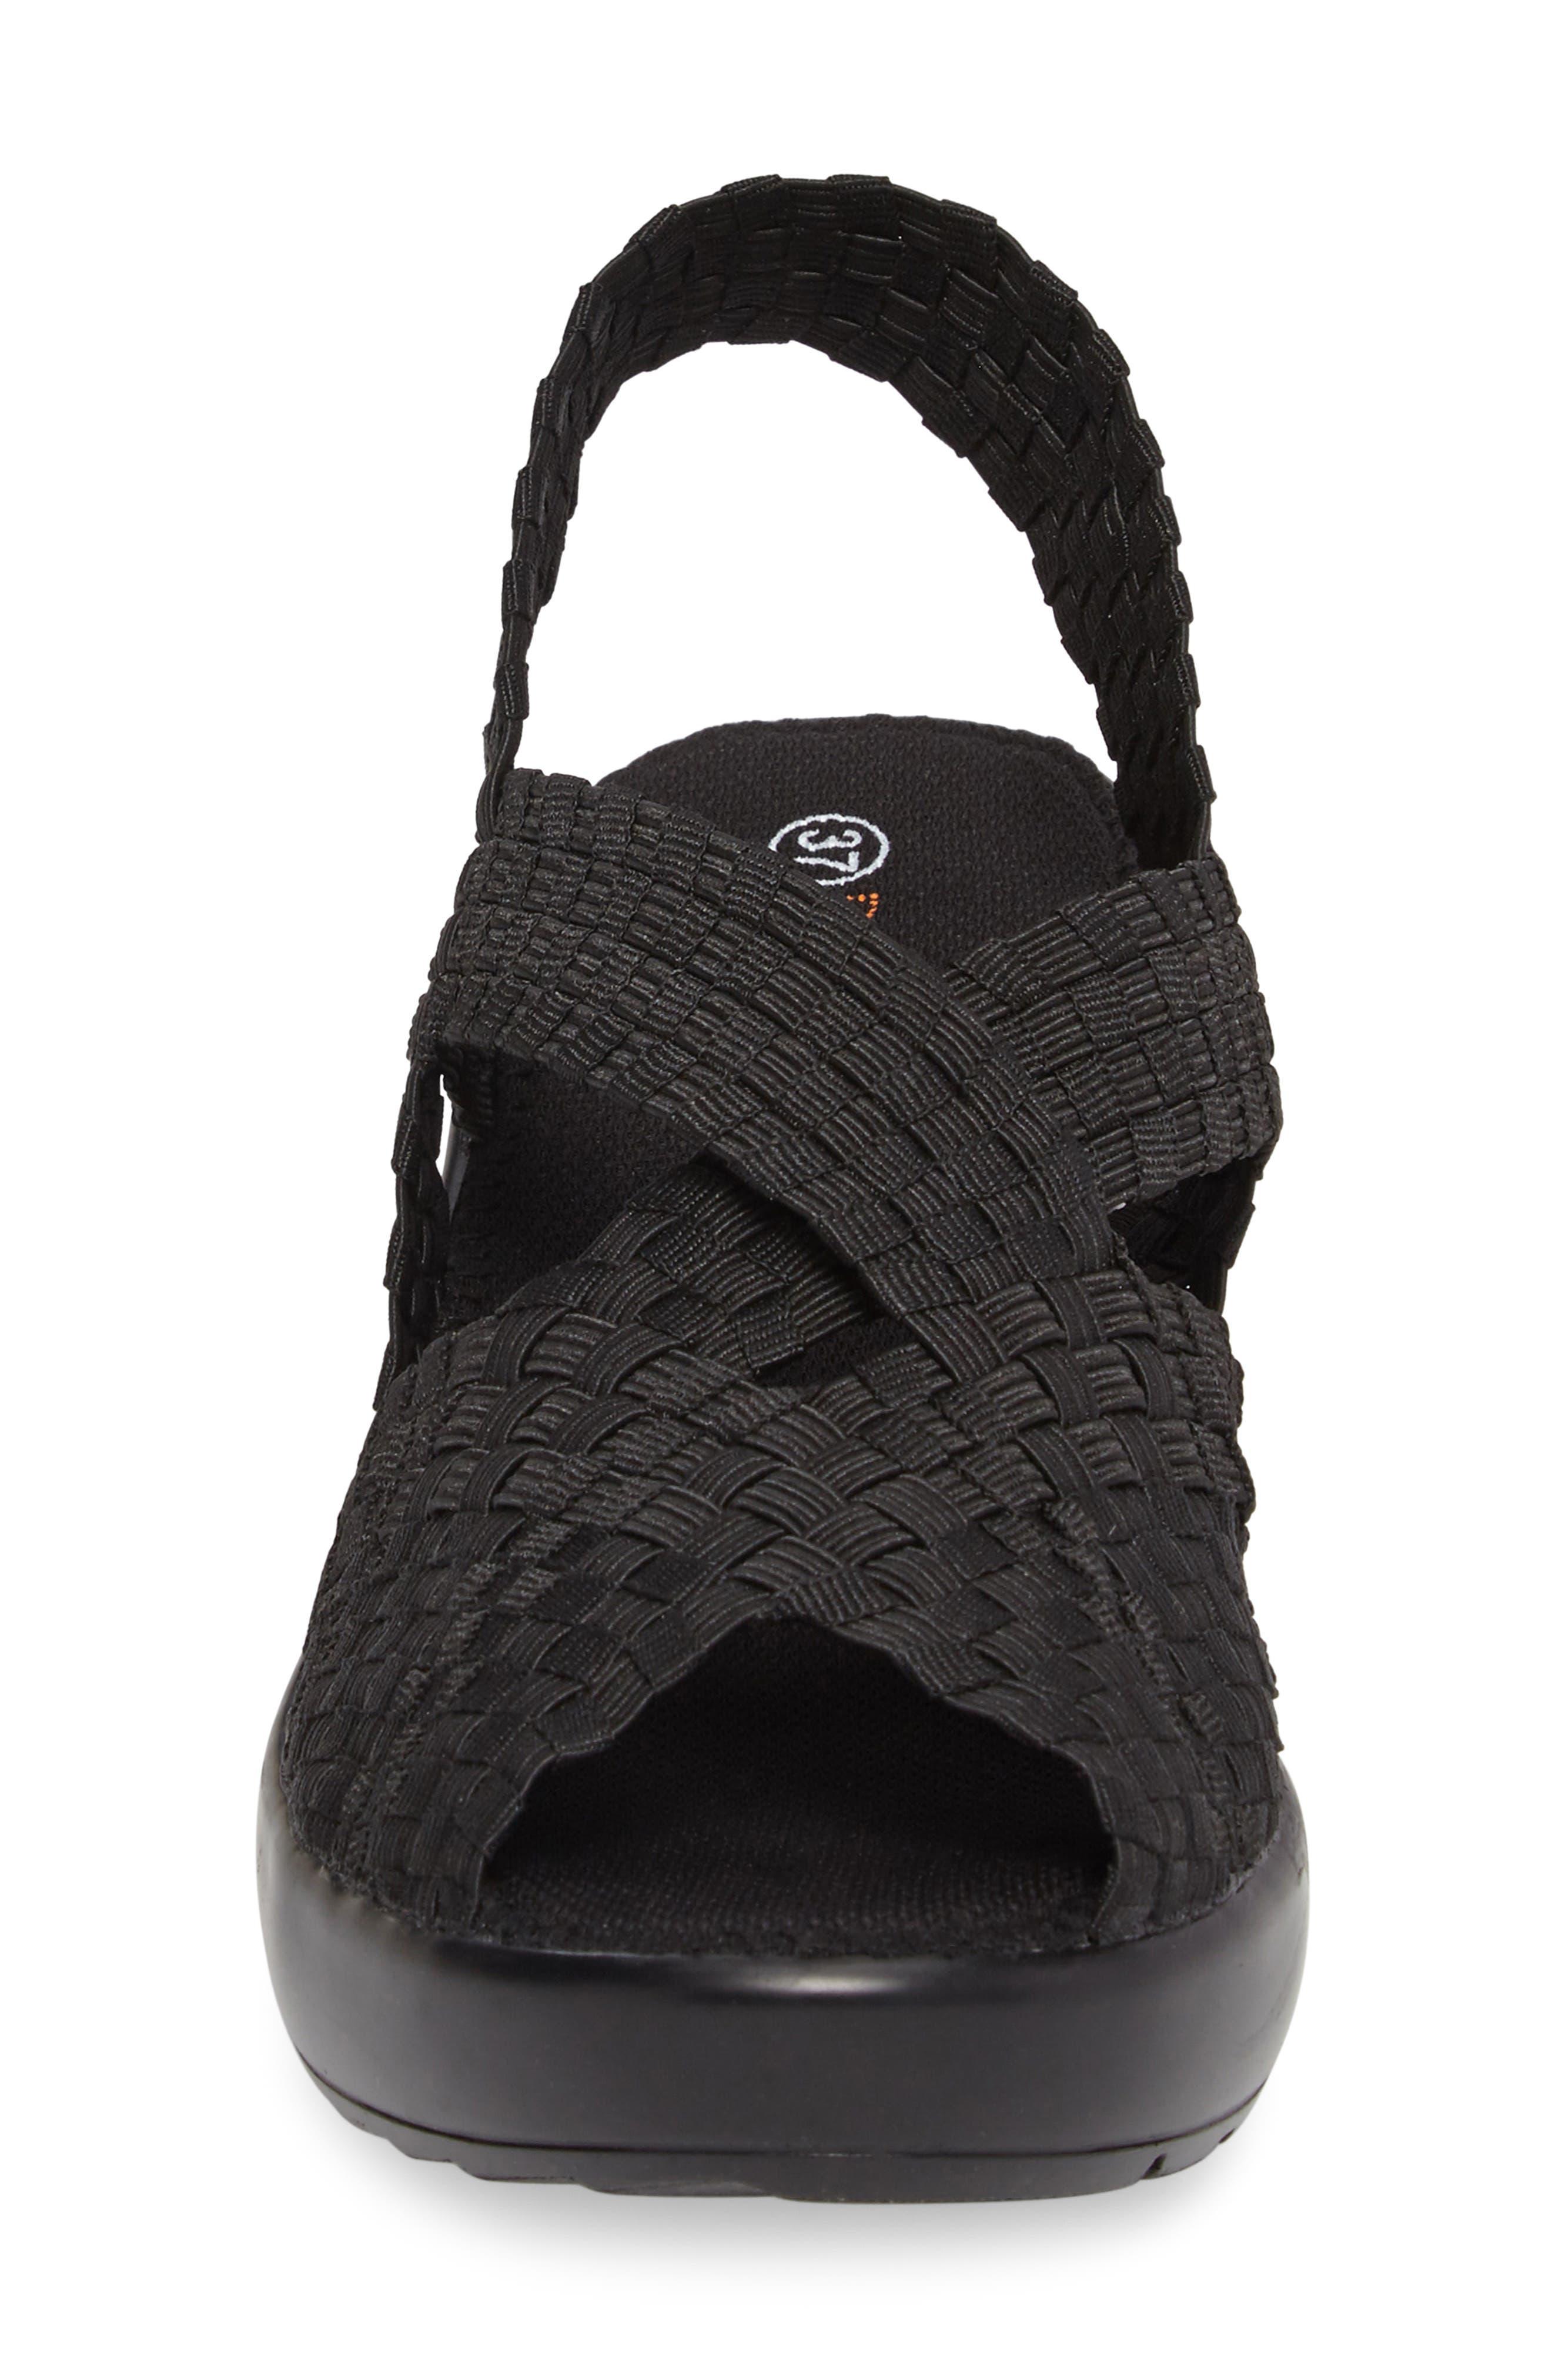 Fresh Brighten Sandal,                             Alternate thumbnail 4, color,                             BLACK FABRIC